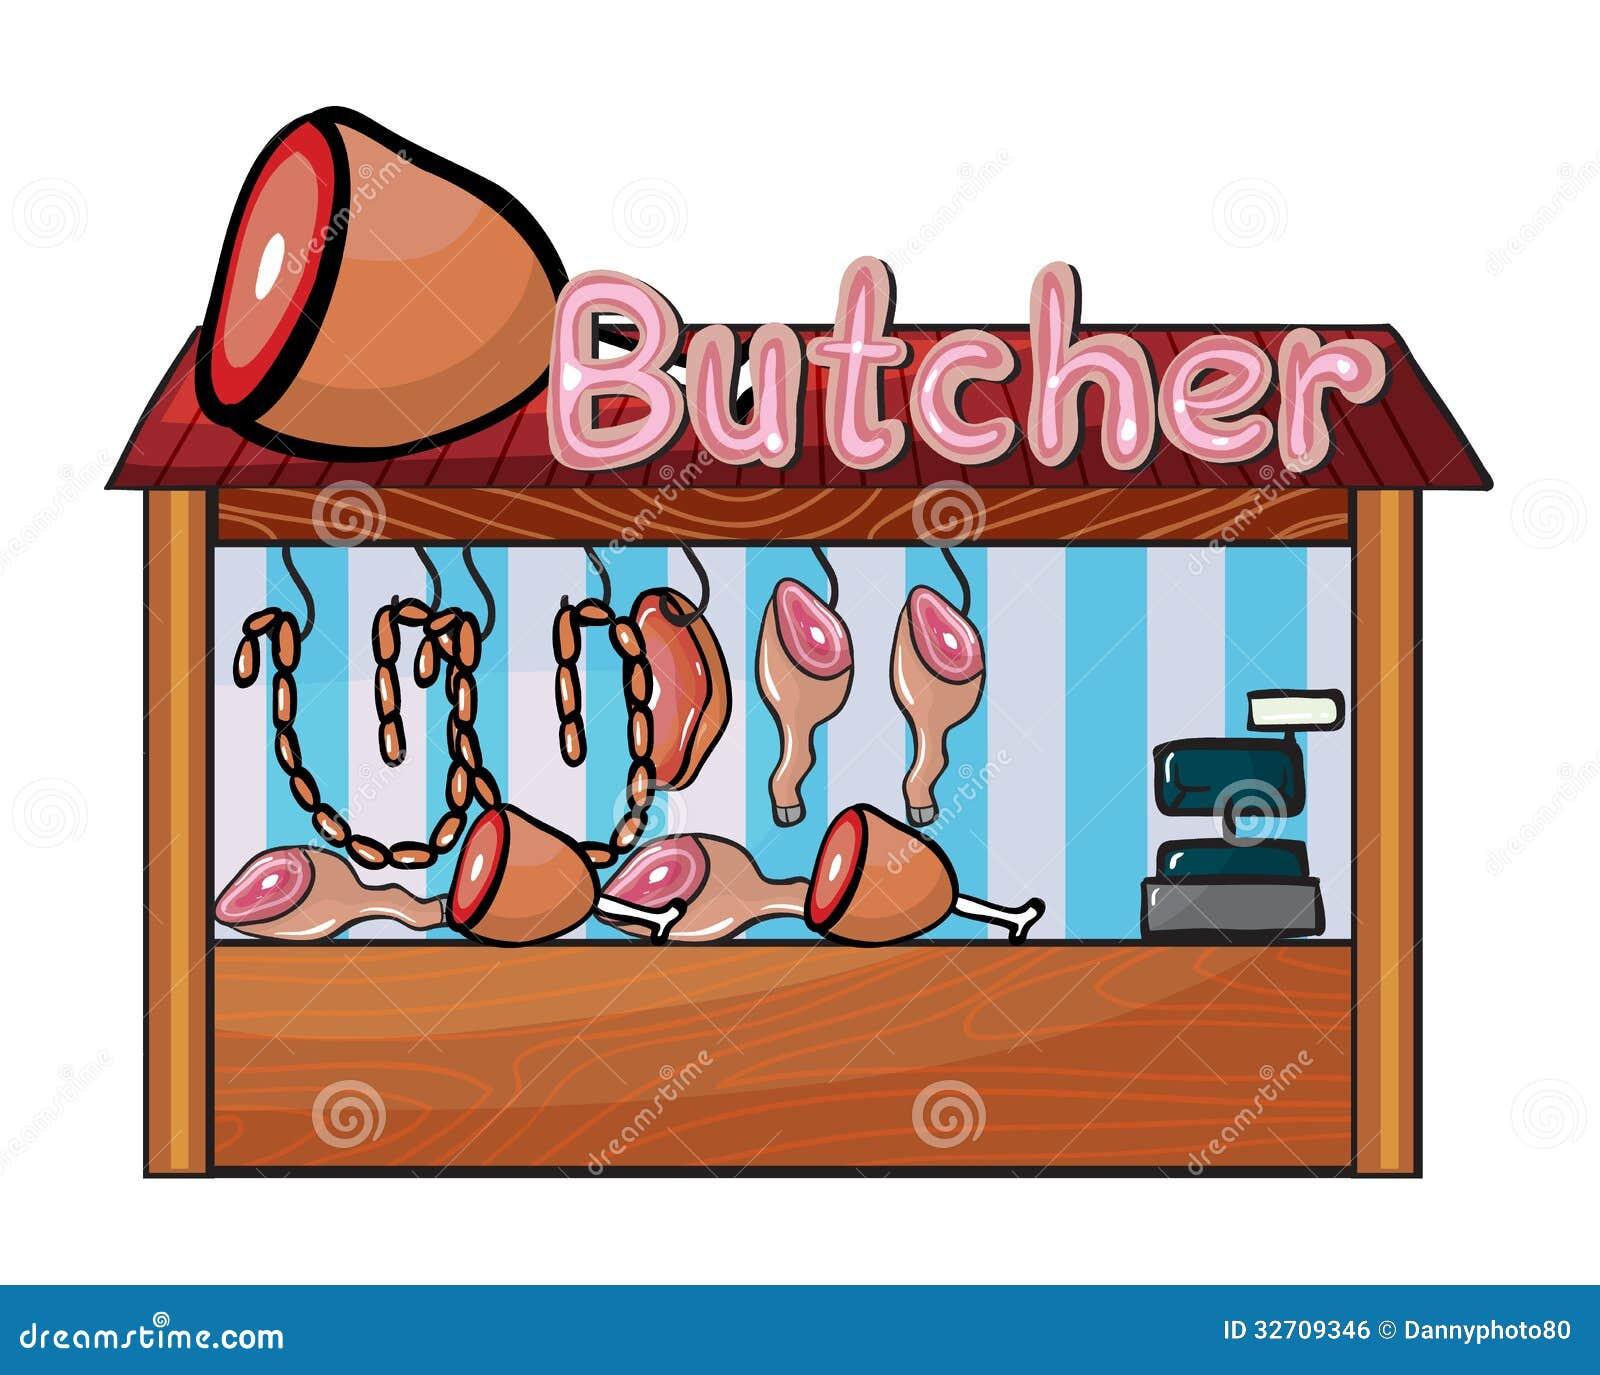 Butcher Shop Royalty Free Stock Image - Image: 32709346